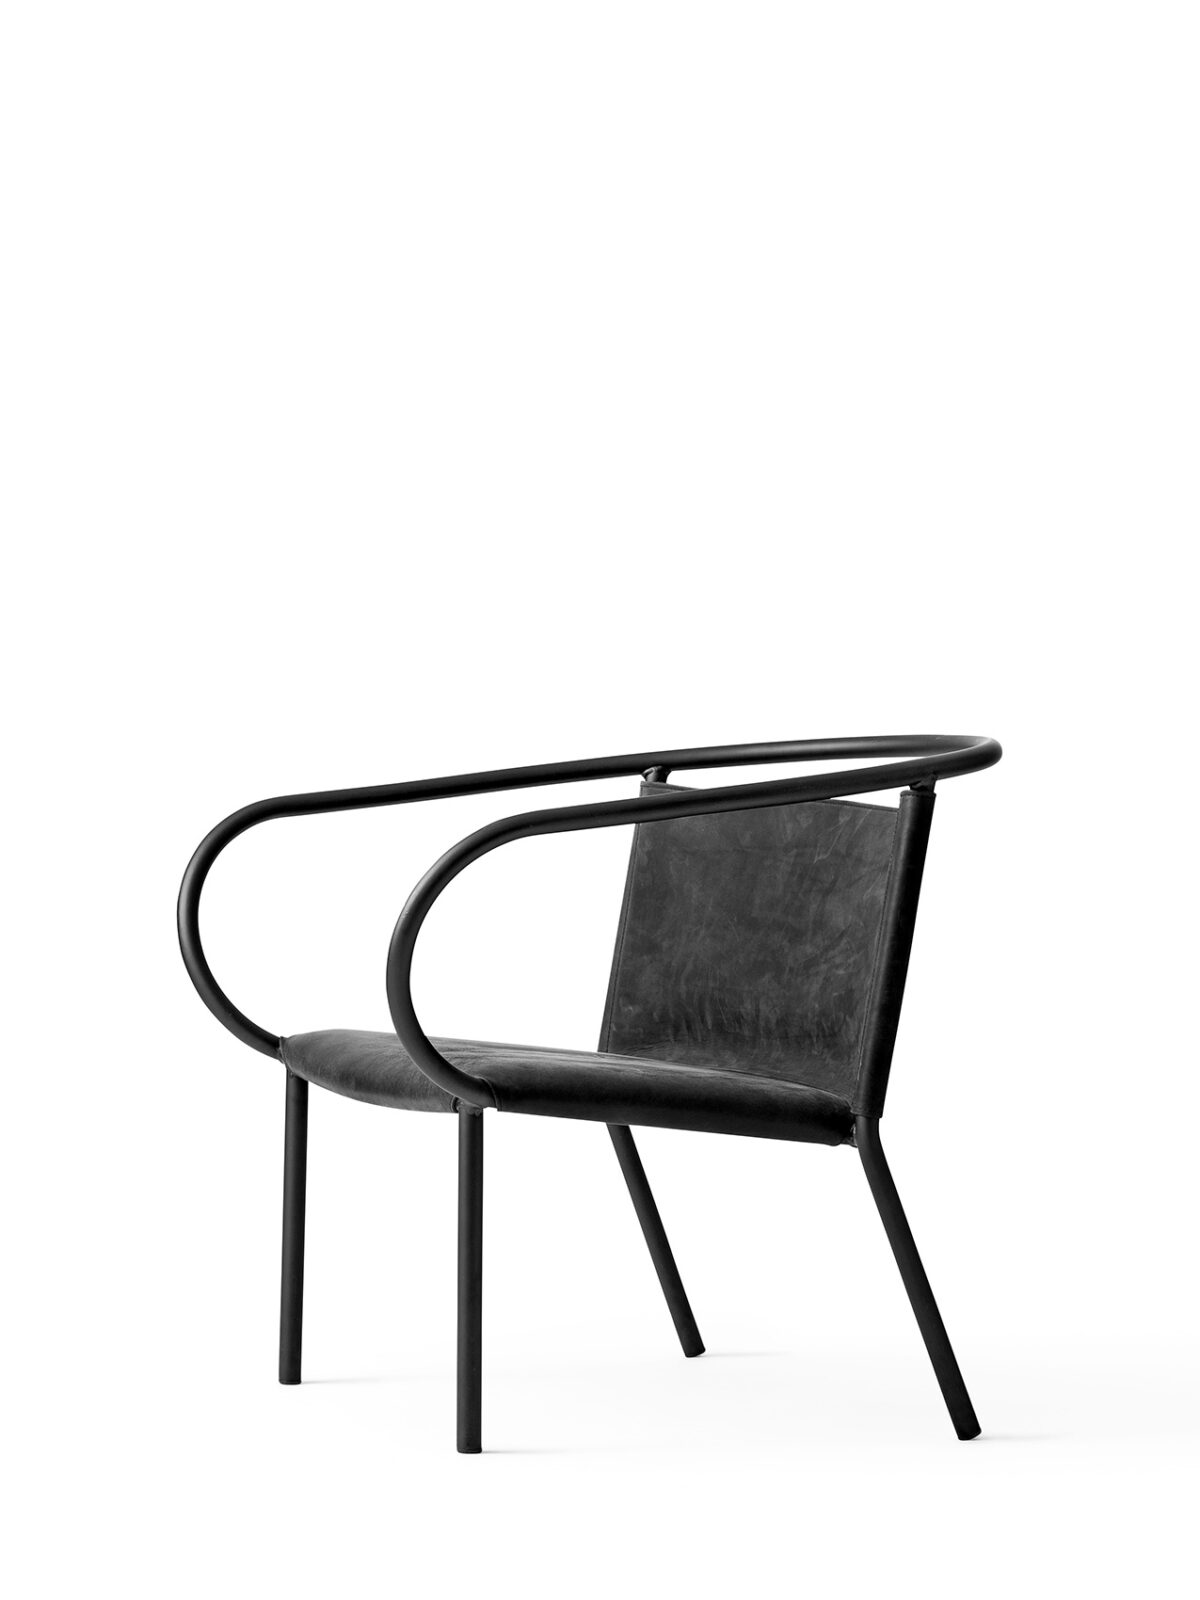 8860539 Afteroom Lounge Chair Afteroom Black 03 2